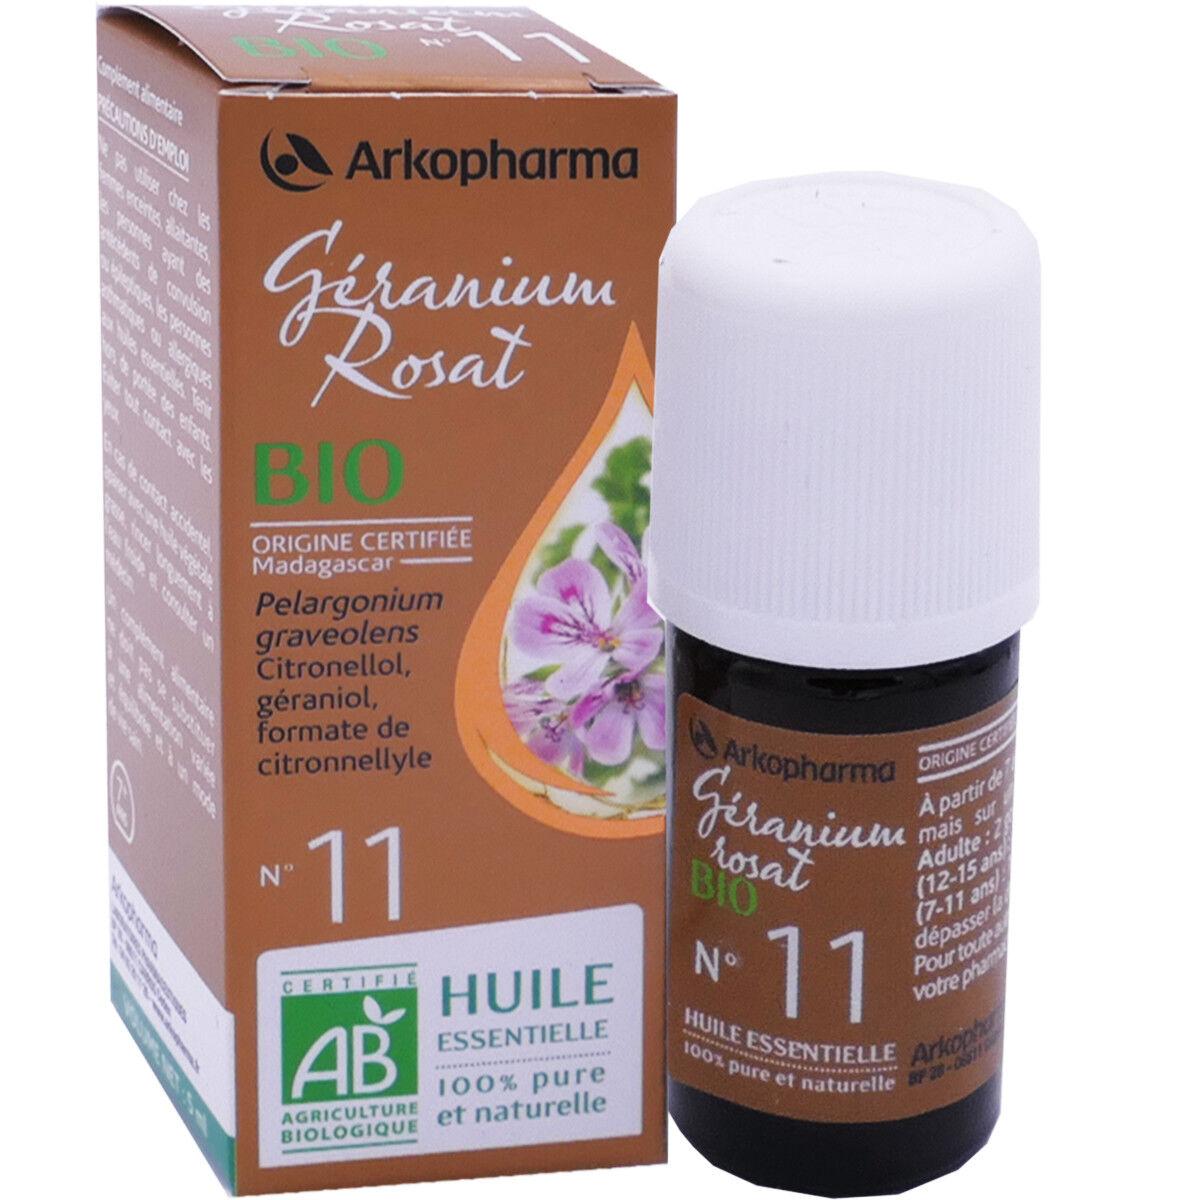 Arkopharma huile essentielle geranium rosat bio n°11 5 ml